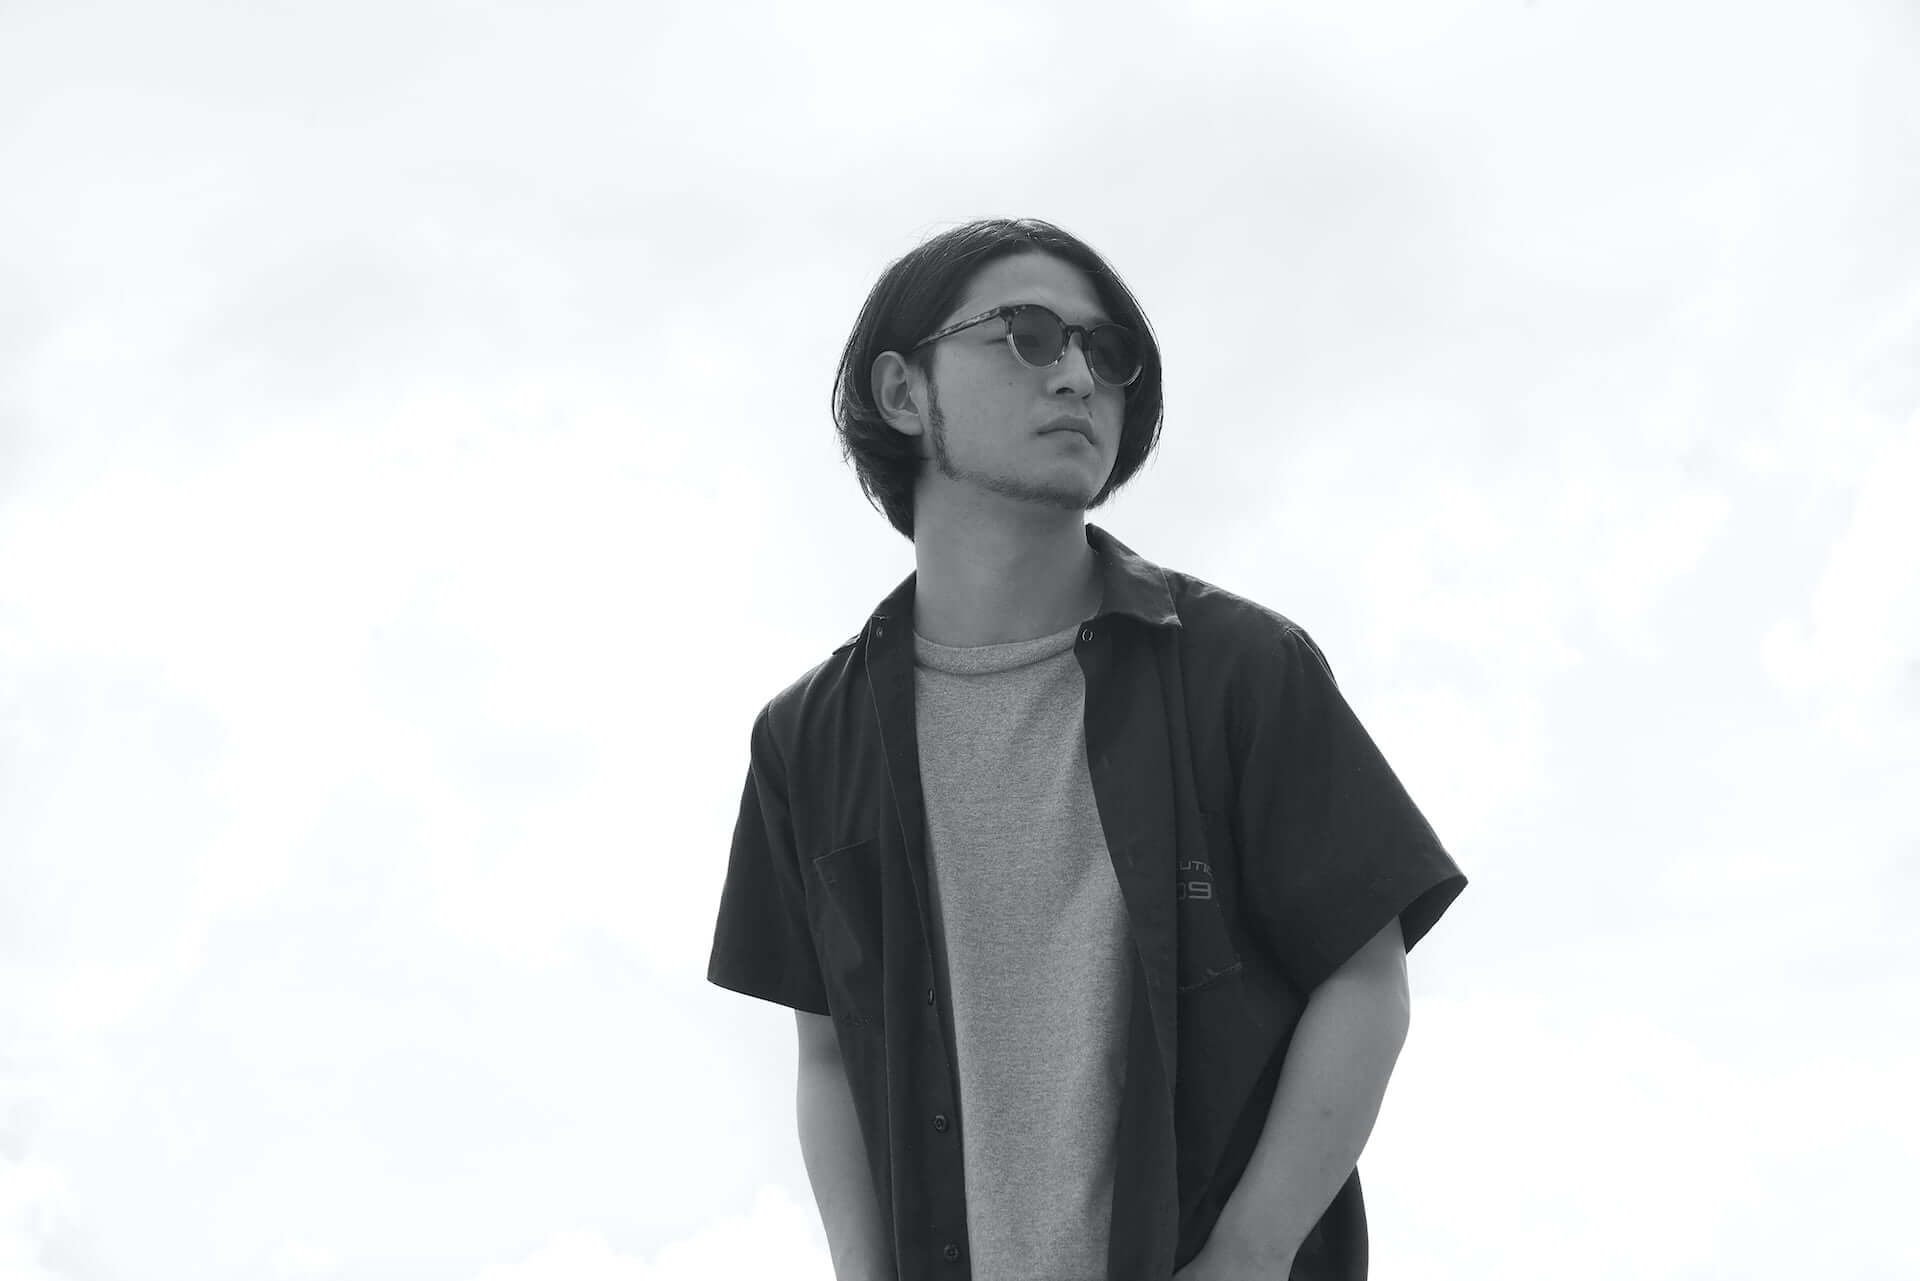 "「Clubhouse」で共同制作されたTAARとANIMAL HACKの新曲""Clubhouse""が今夜公開!Seiho、CHICO CARLITO、ハセガワダイスケらが参加 music210201_clubhouse-taar-masato_5-1920x1281"